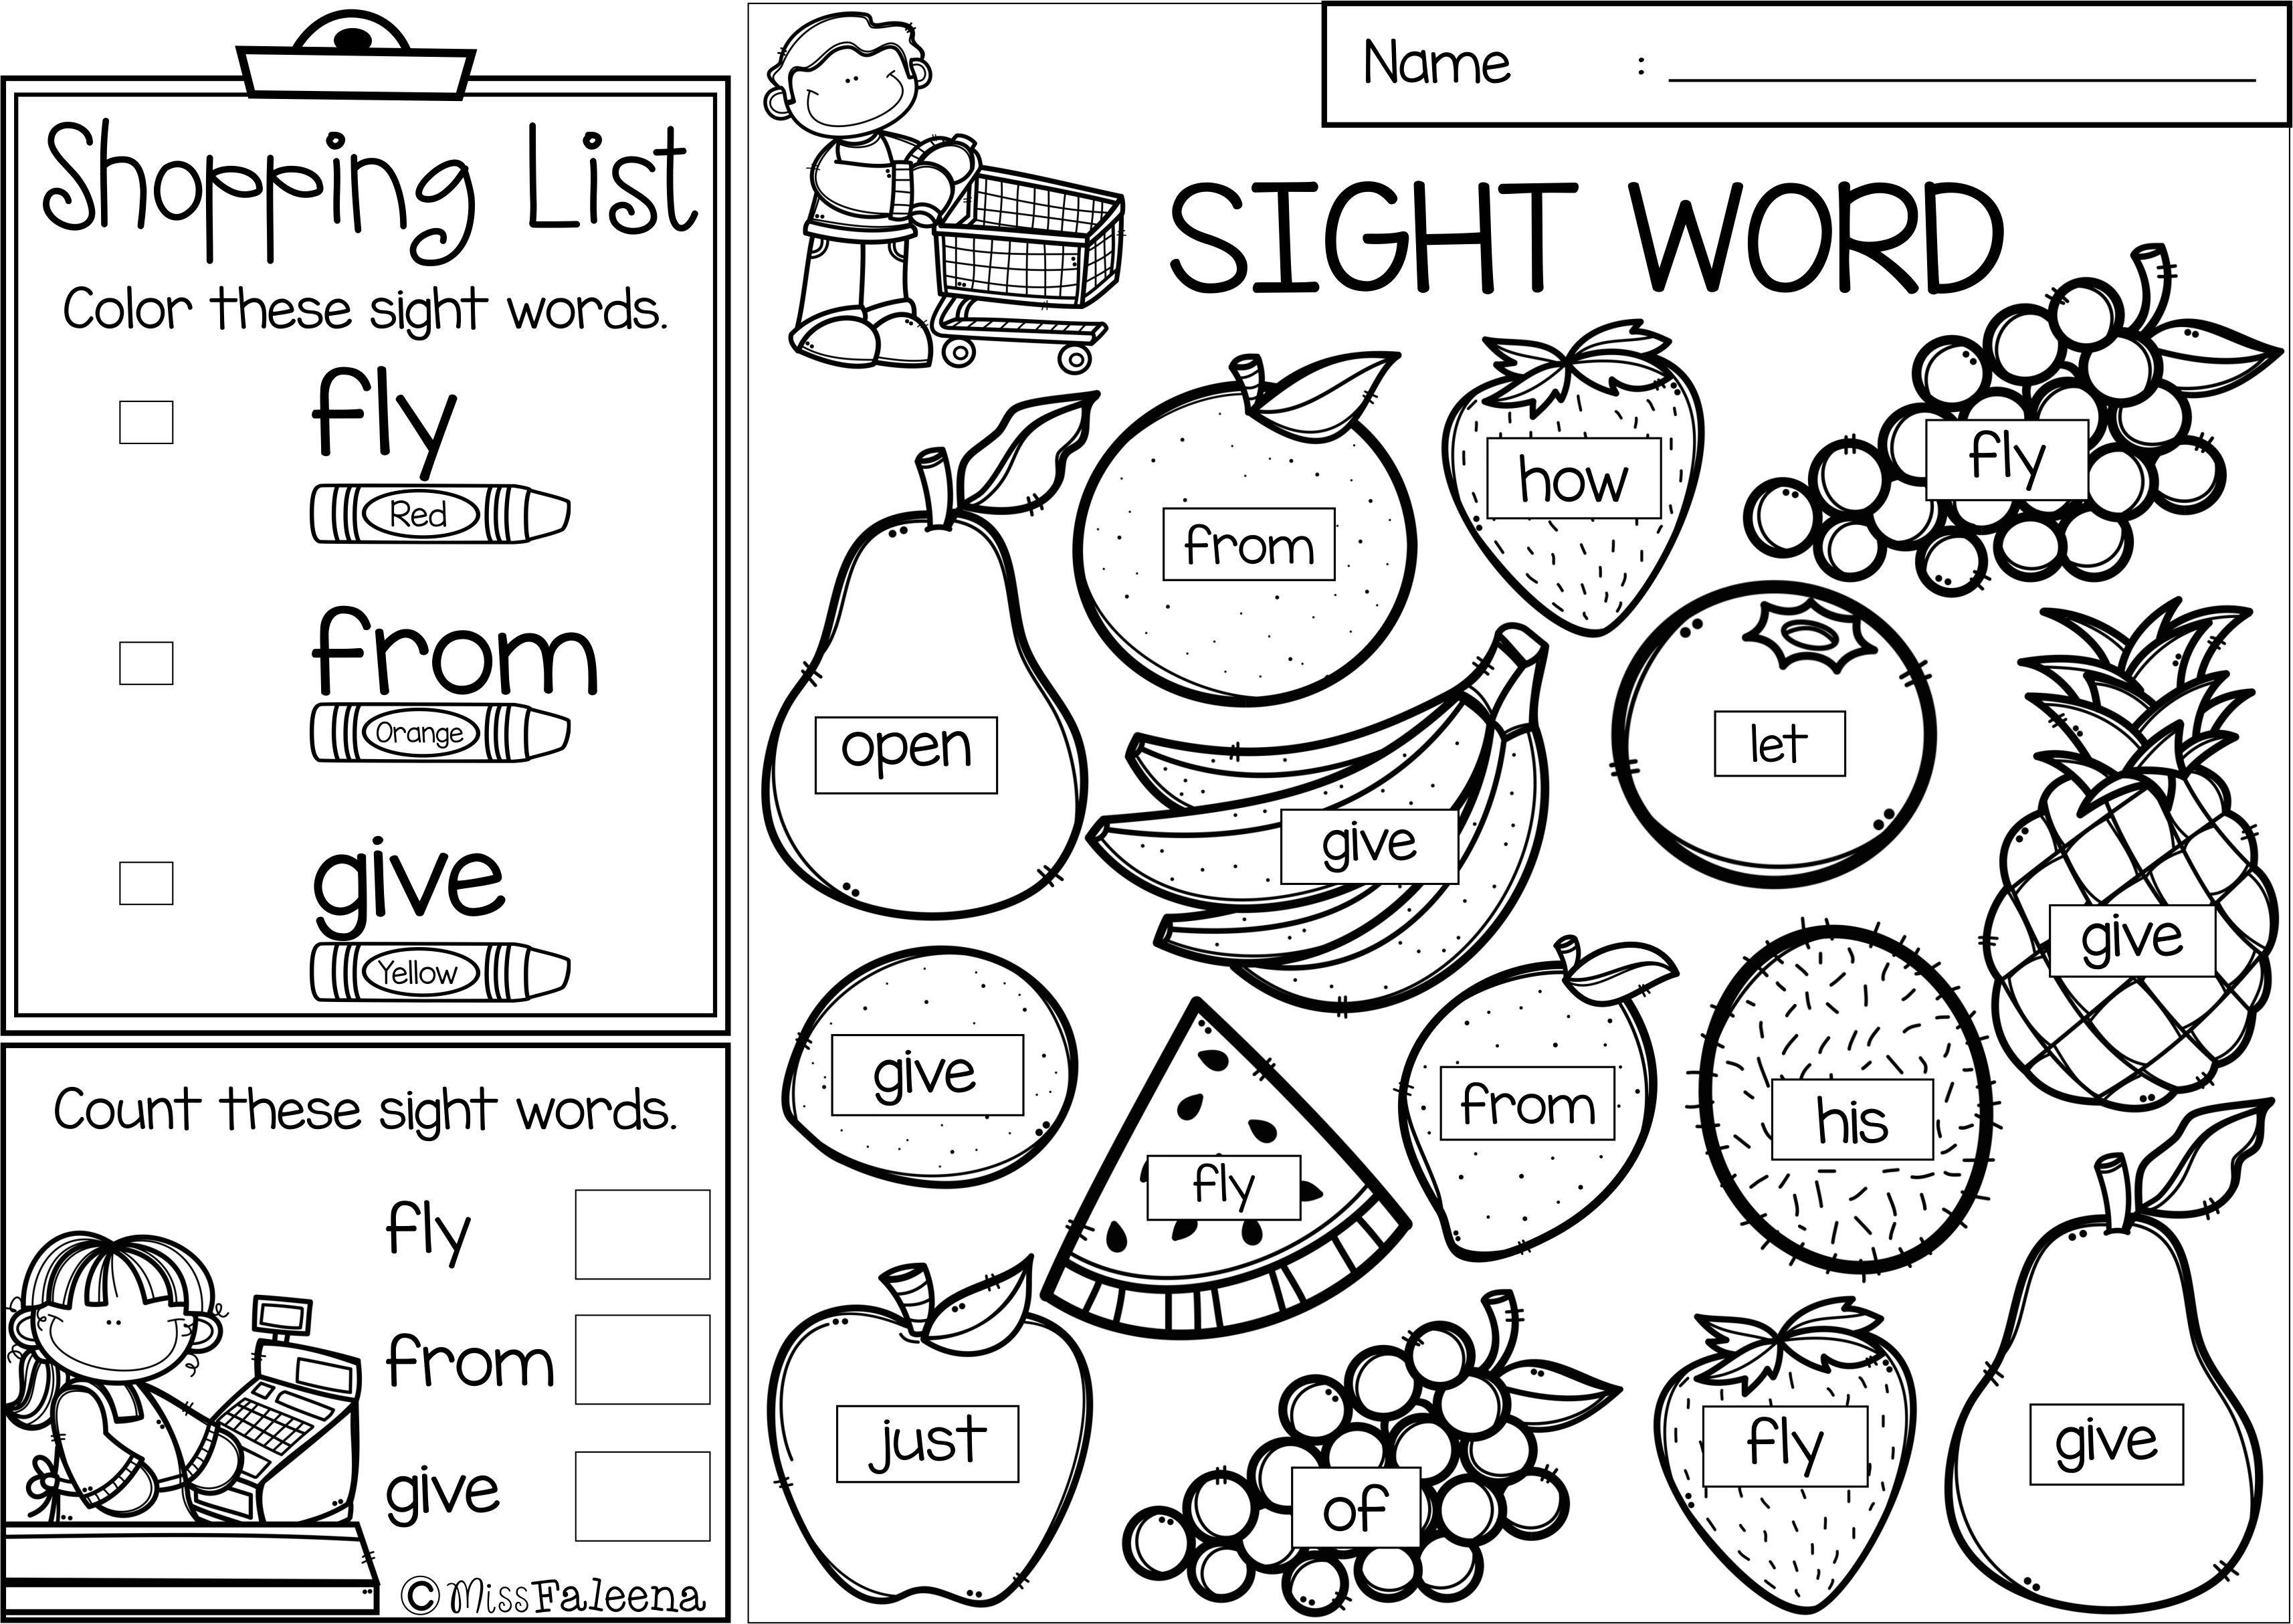 Sight Word Shop Find Color The Bundle Sight Words Sight Word Worksheets First Grade Sight Words [ 2428 x 3428 Pixel ]